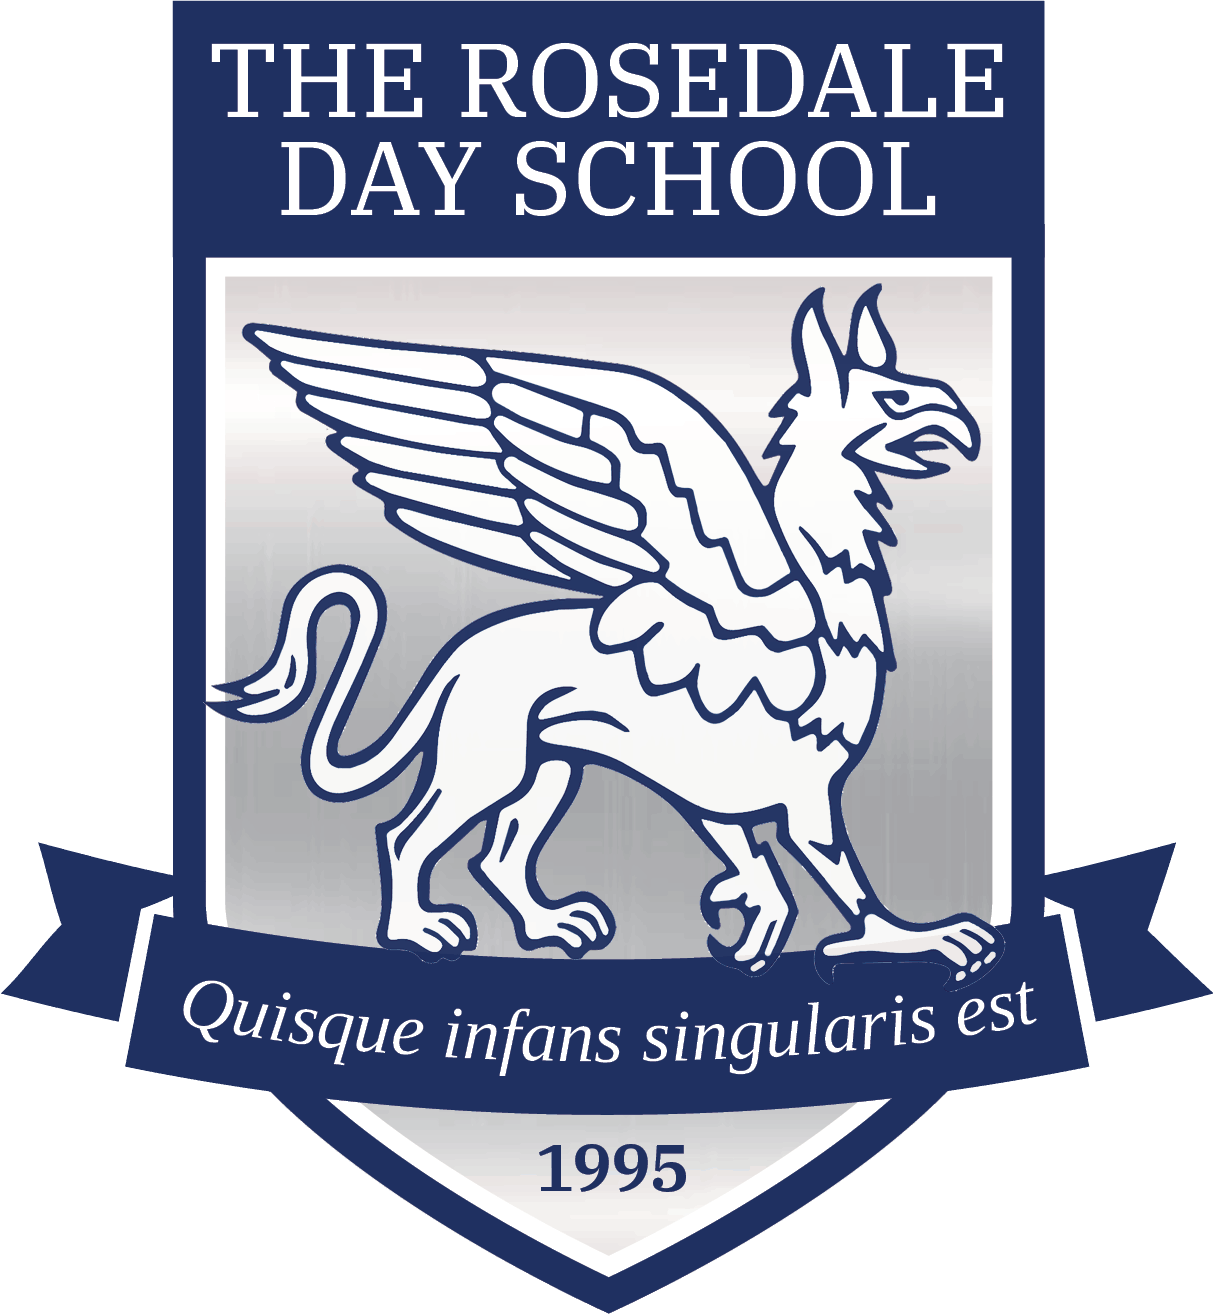 The Rosedale Day School